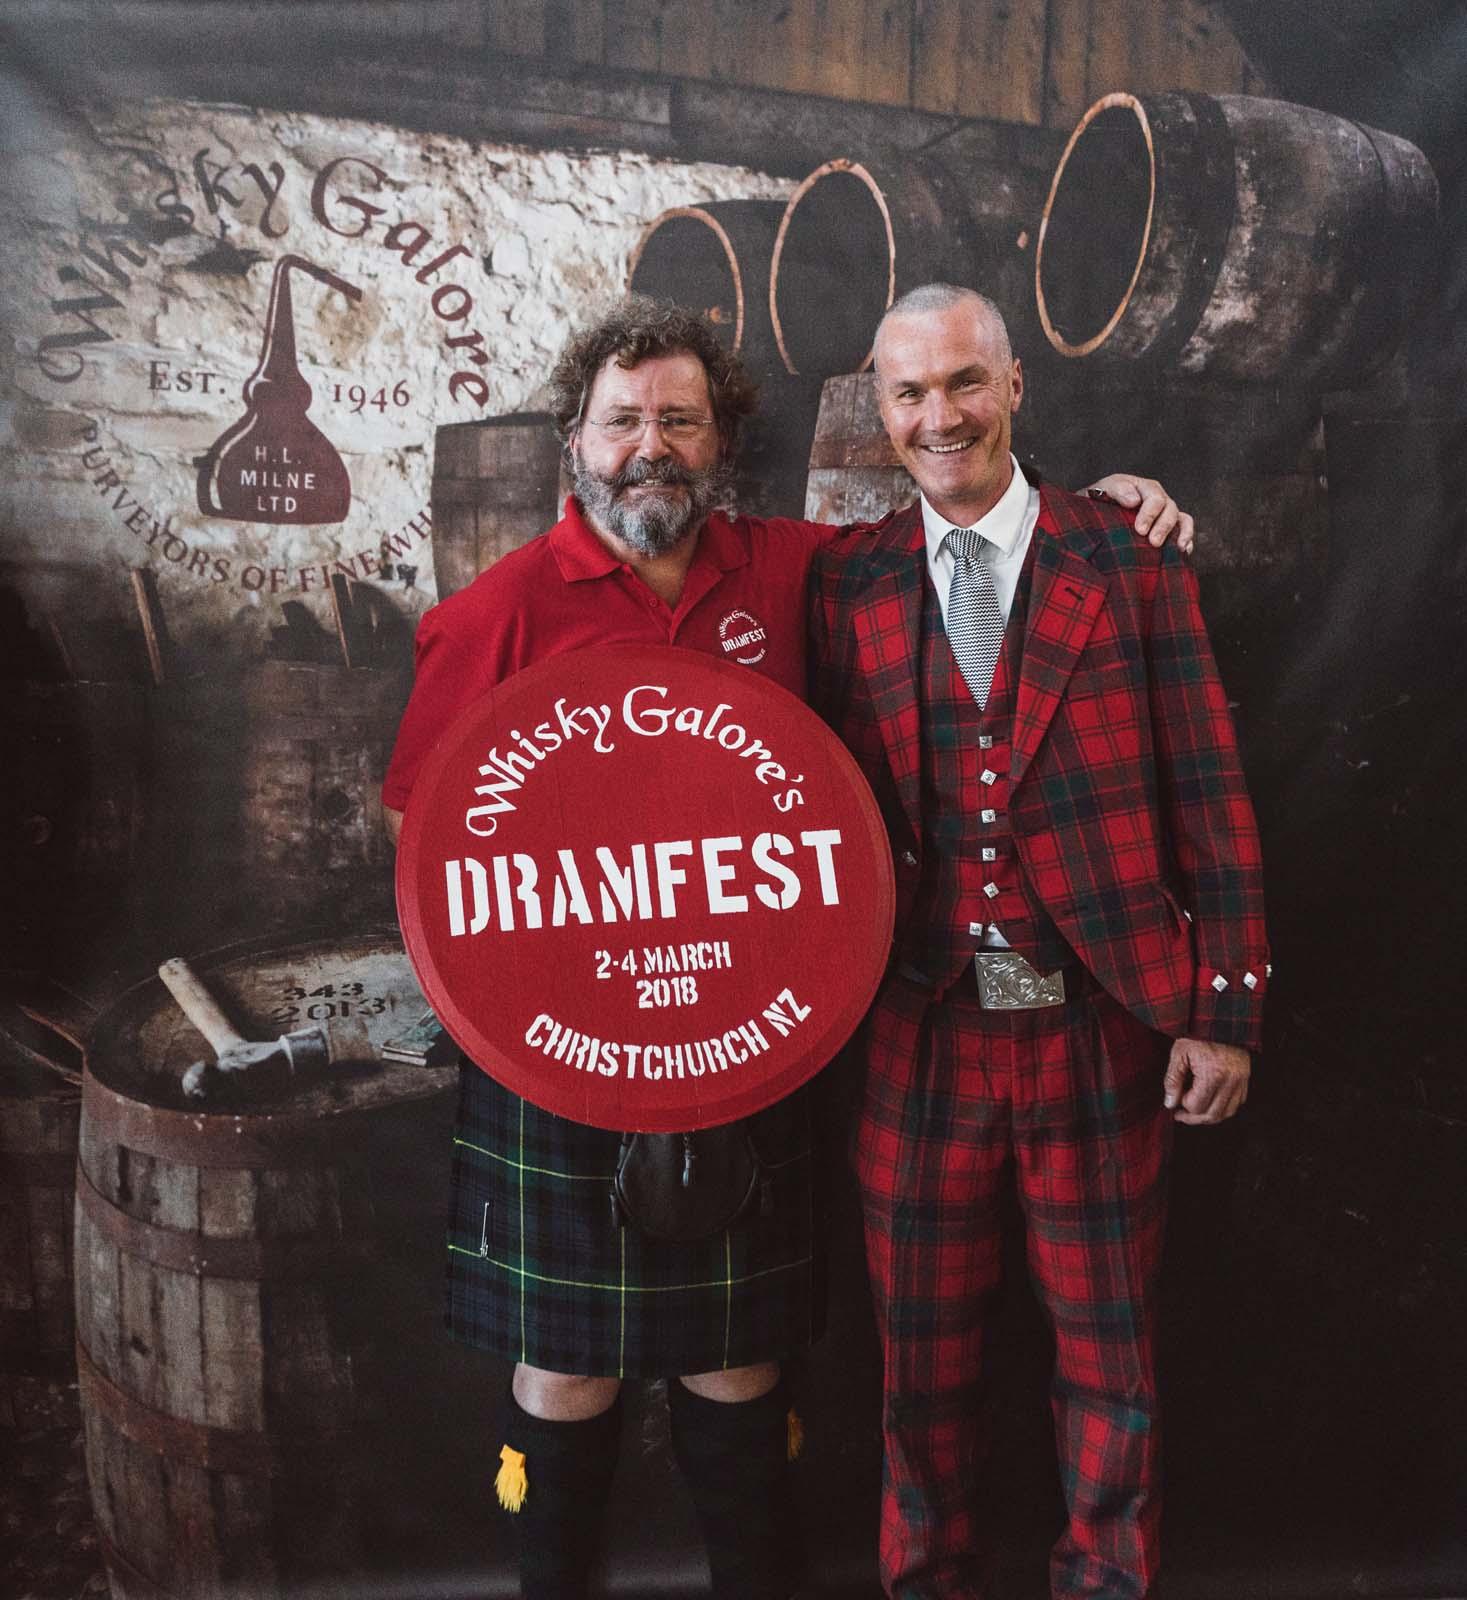 Dramfest 2018 for Whisky Galore-95.jpg